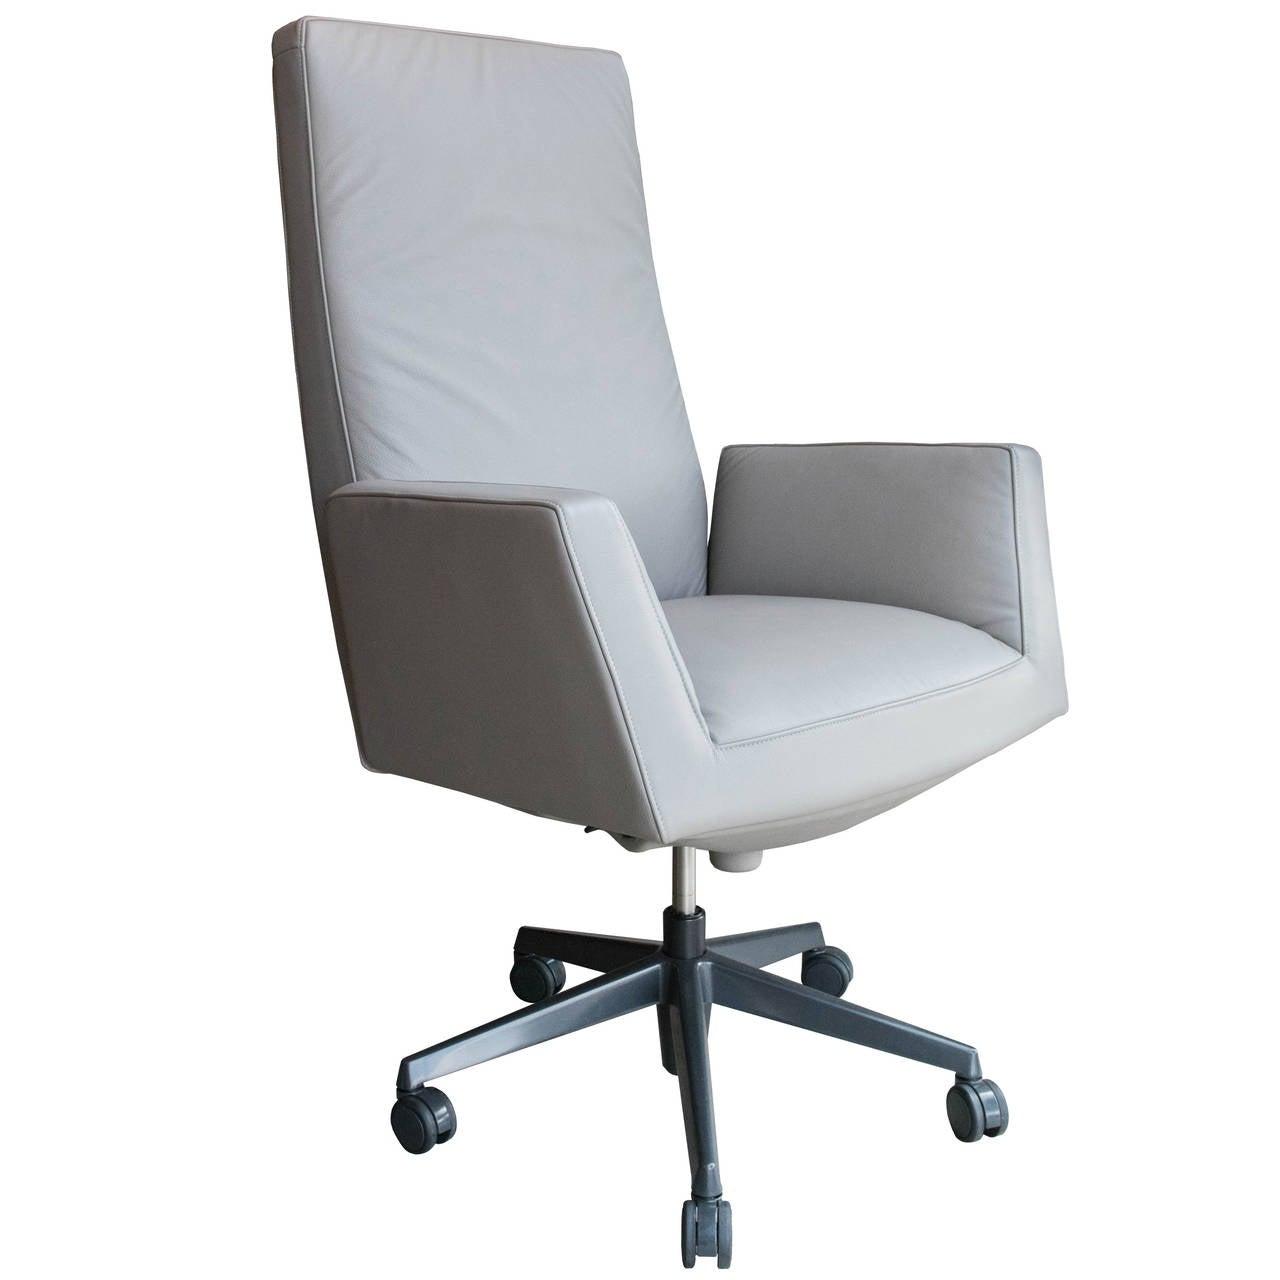 Leather sofa by poltrona frau at 1stdibs - Poltrona Frau Chancellor President Chair 1